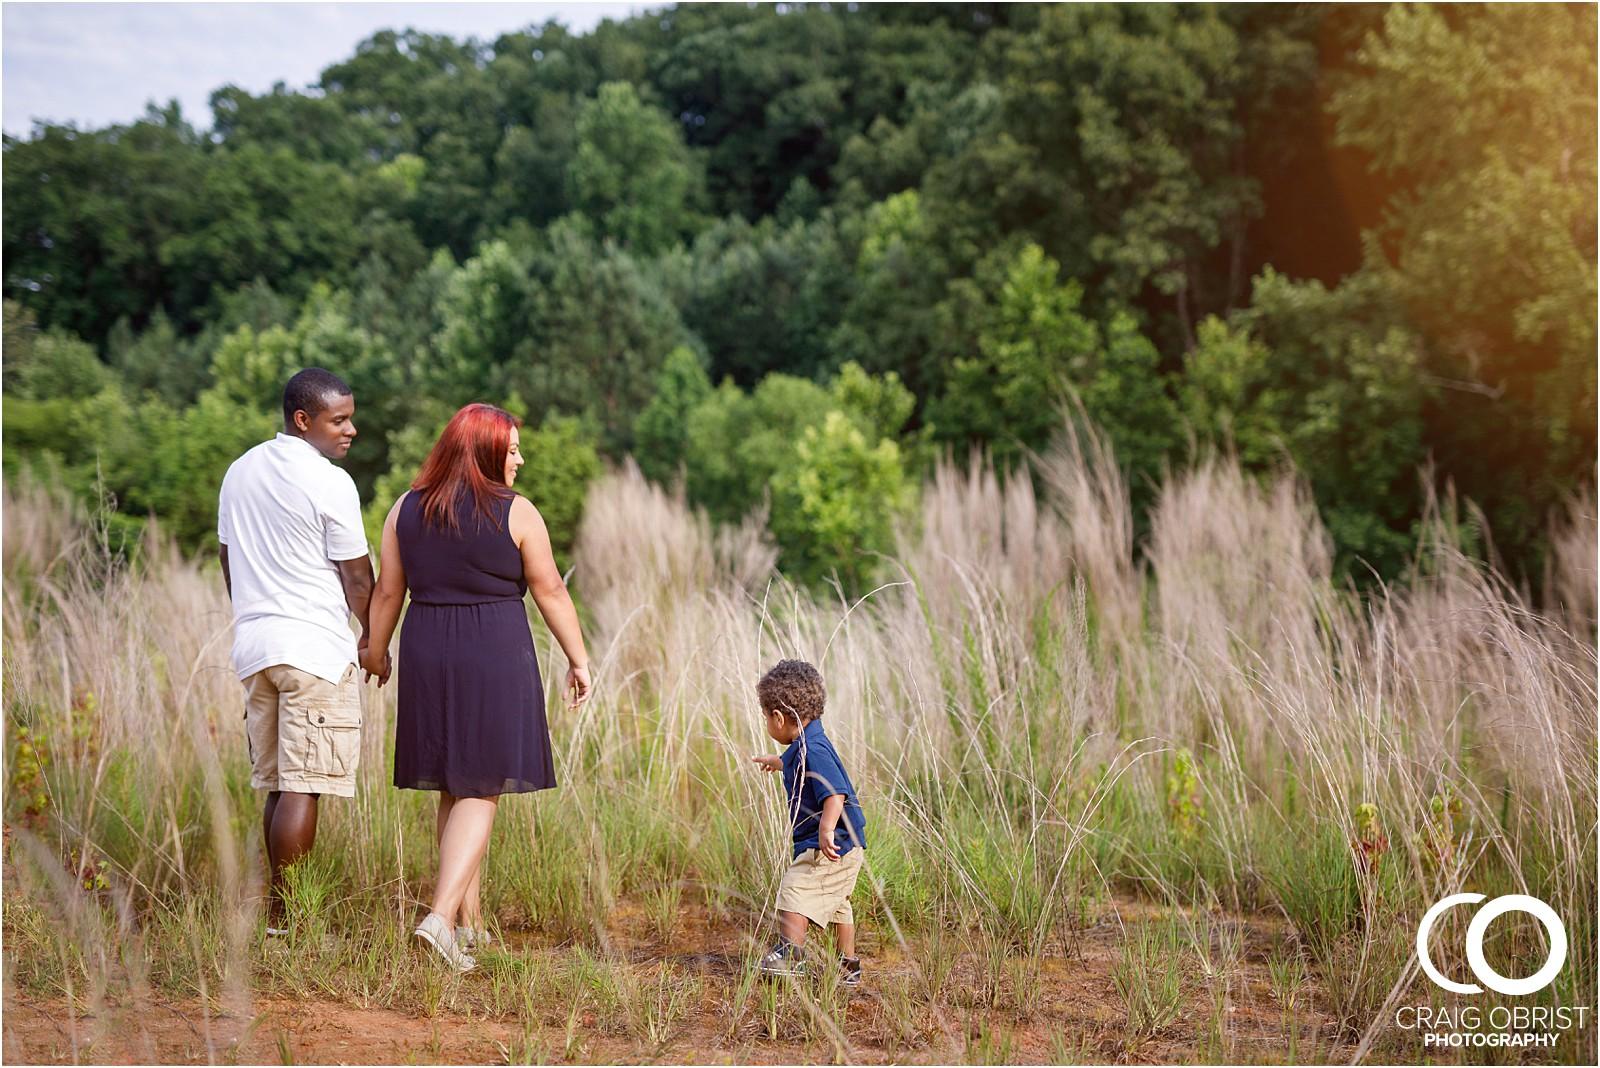 Grass Field Family Portratis Sunset Atlanta_0019.jpg